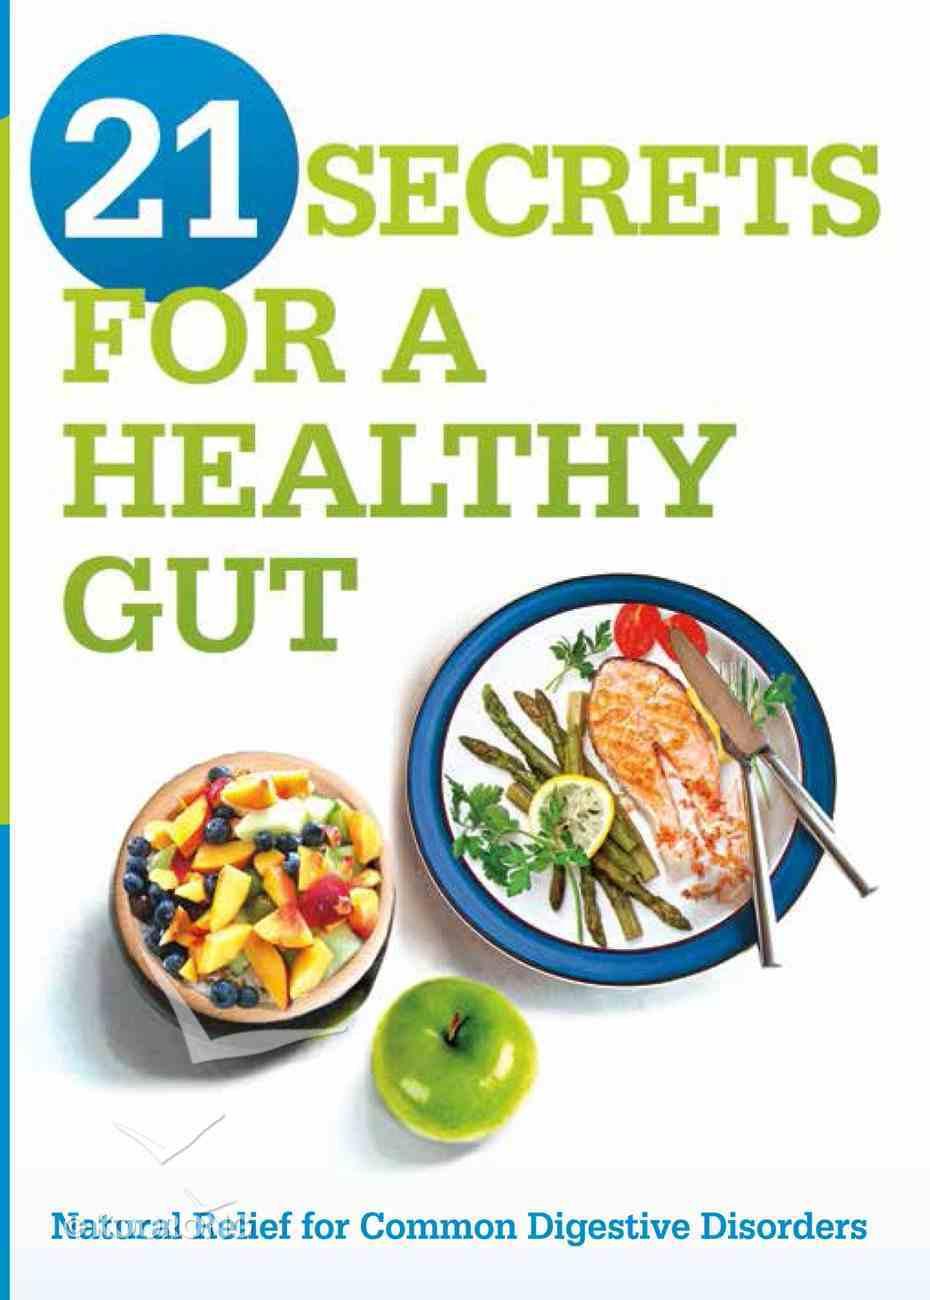 21 Secrets For a Healthy Gut eBook